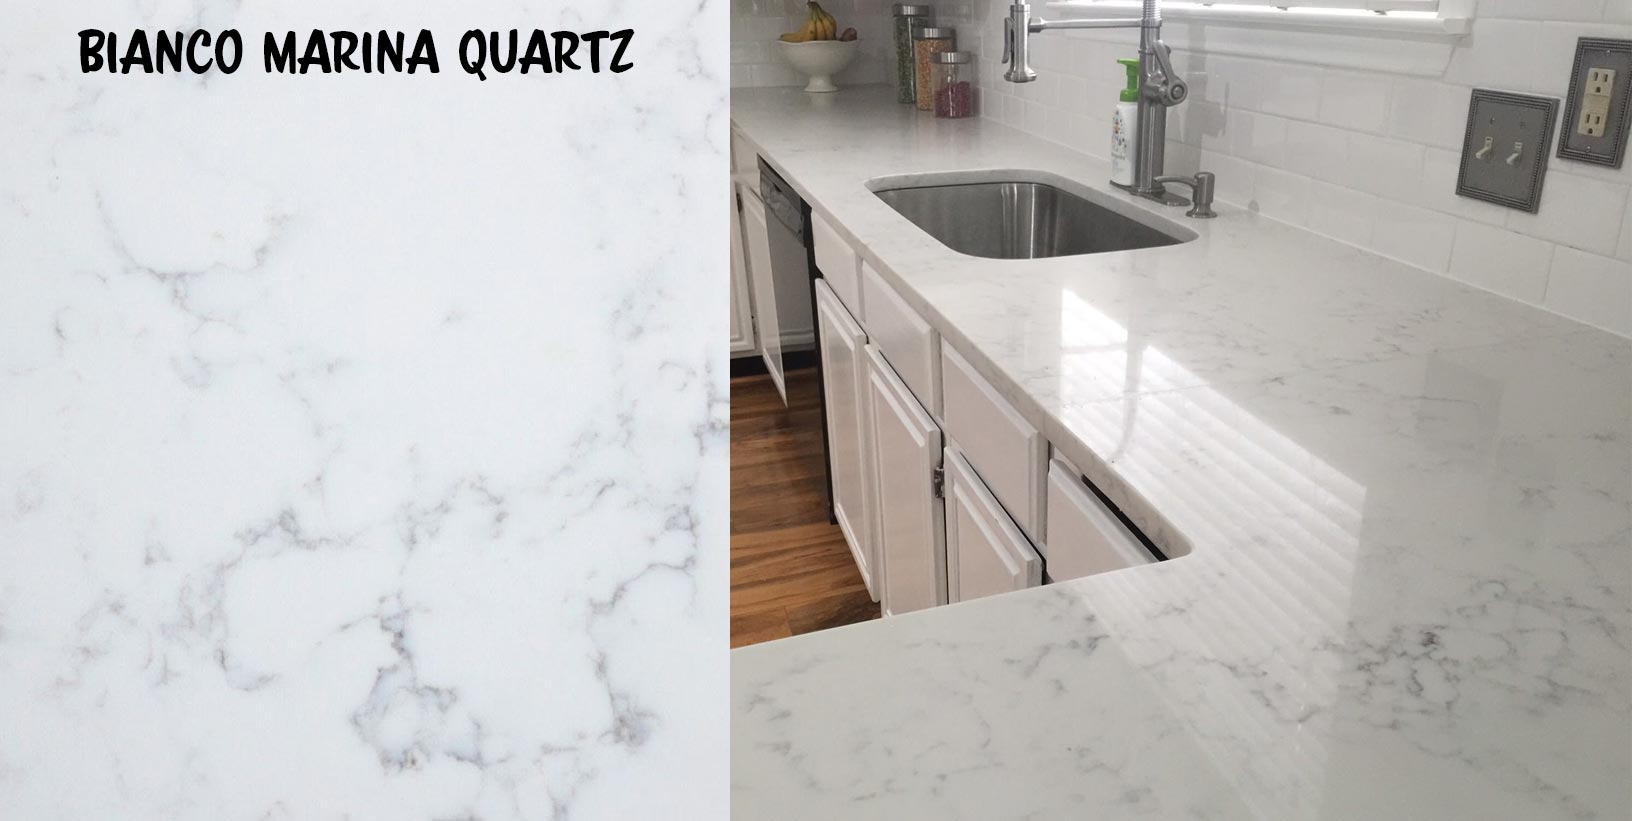 Bianco Marina Quartz